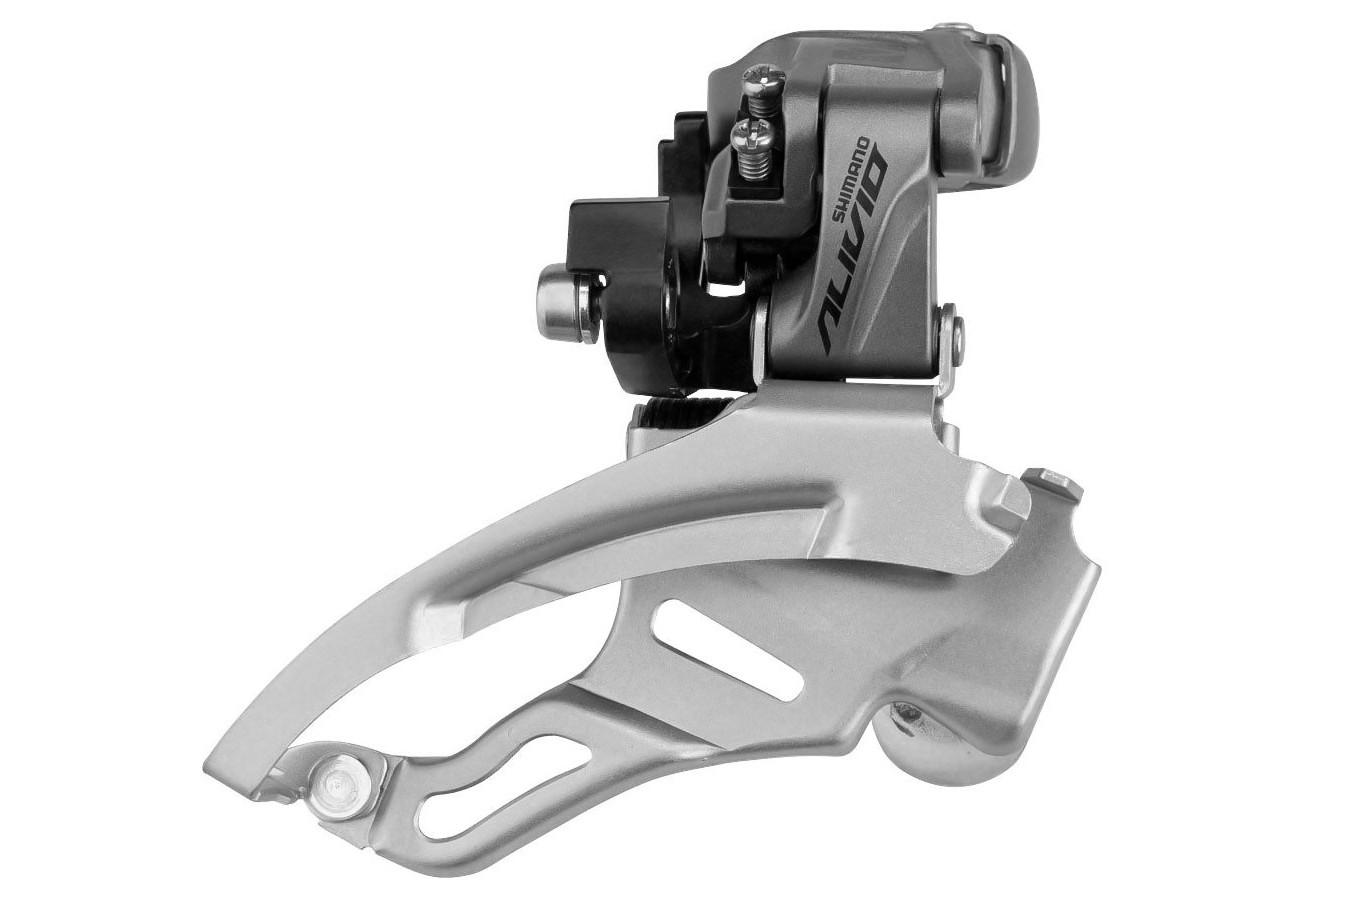 Cambio Dianteiro Alivio FD-M4000 Dual Pull Down Swing - Shimano